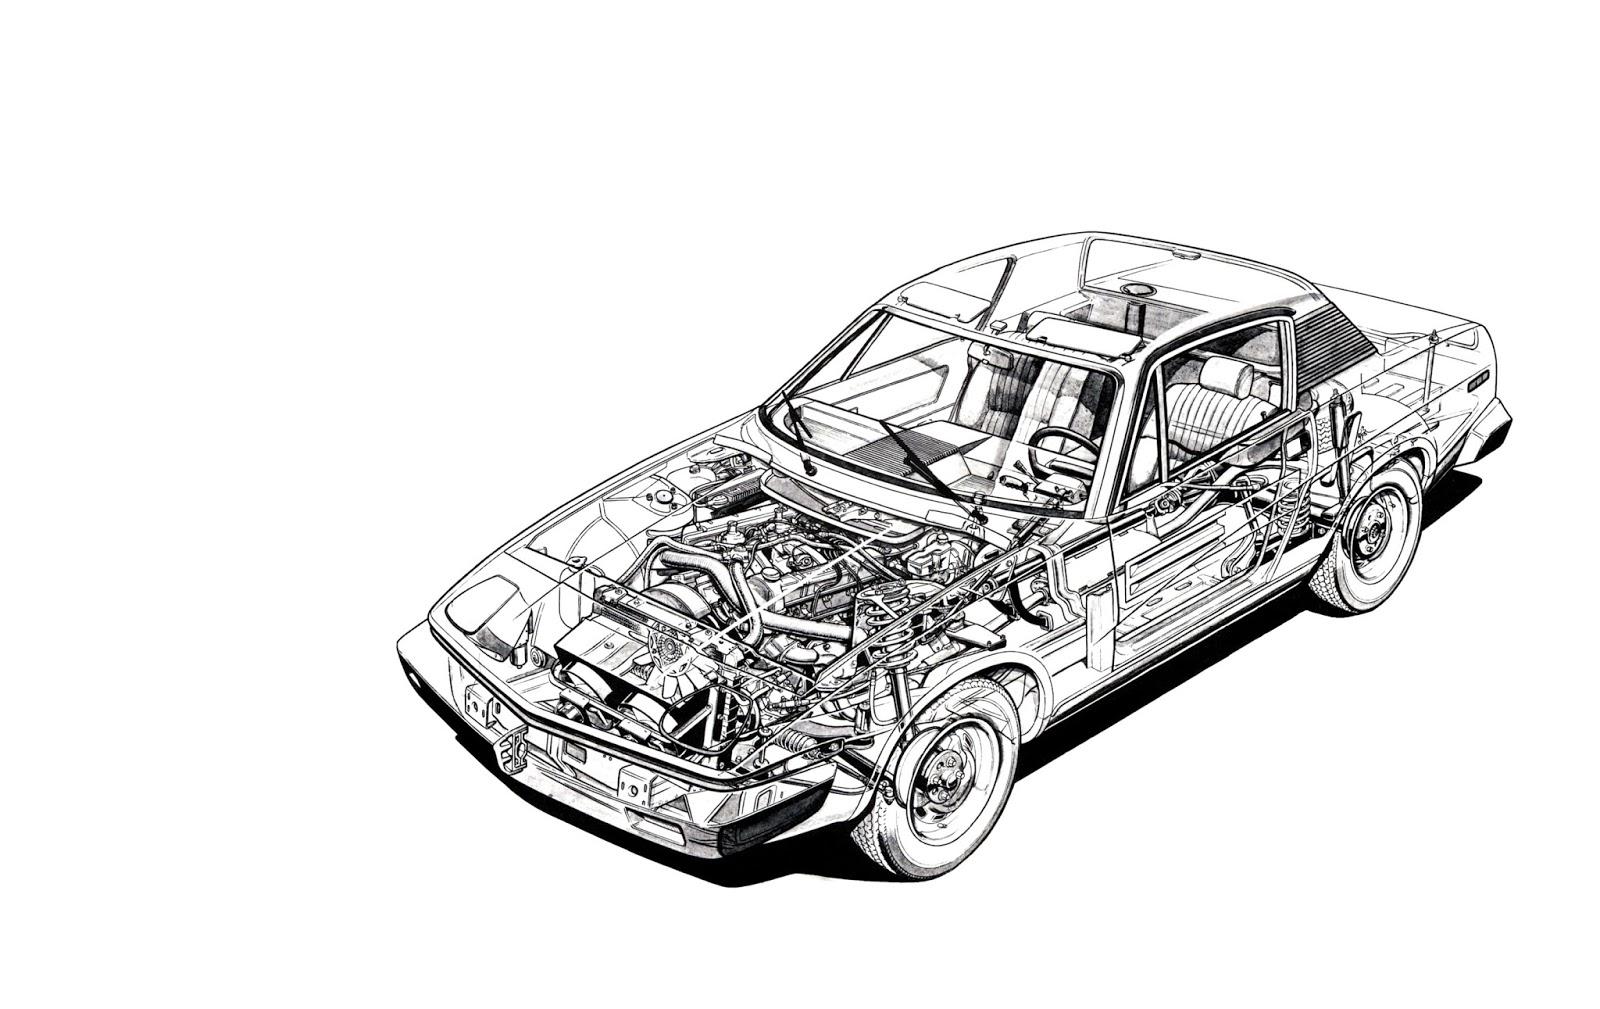 Triumph TR7 cut away image 2